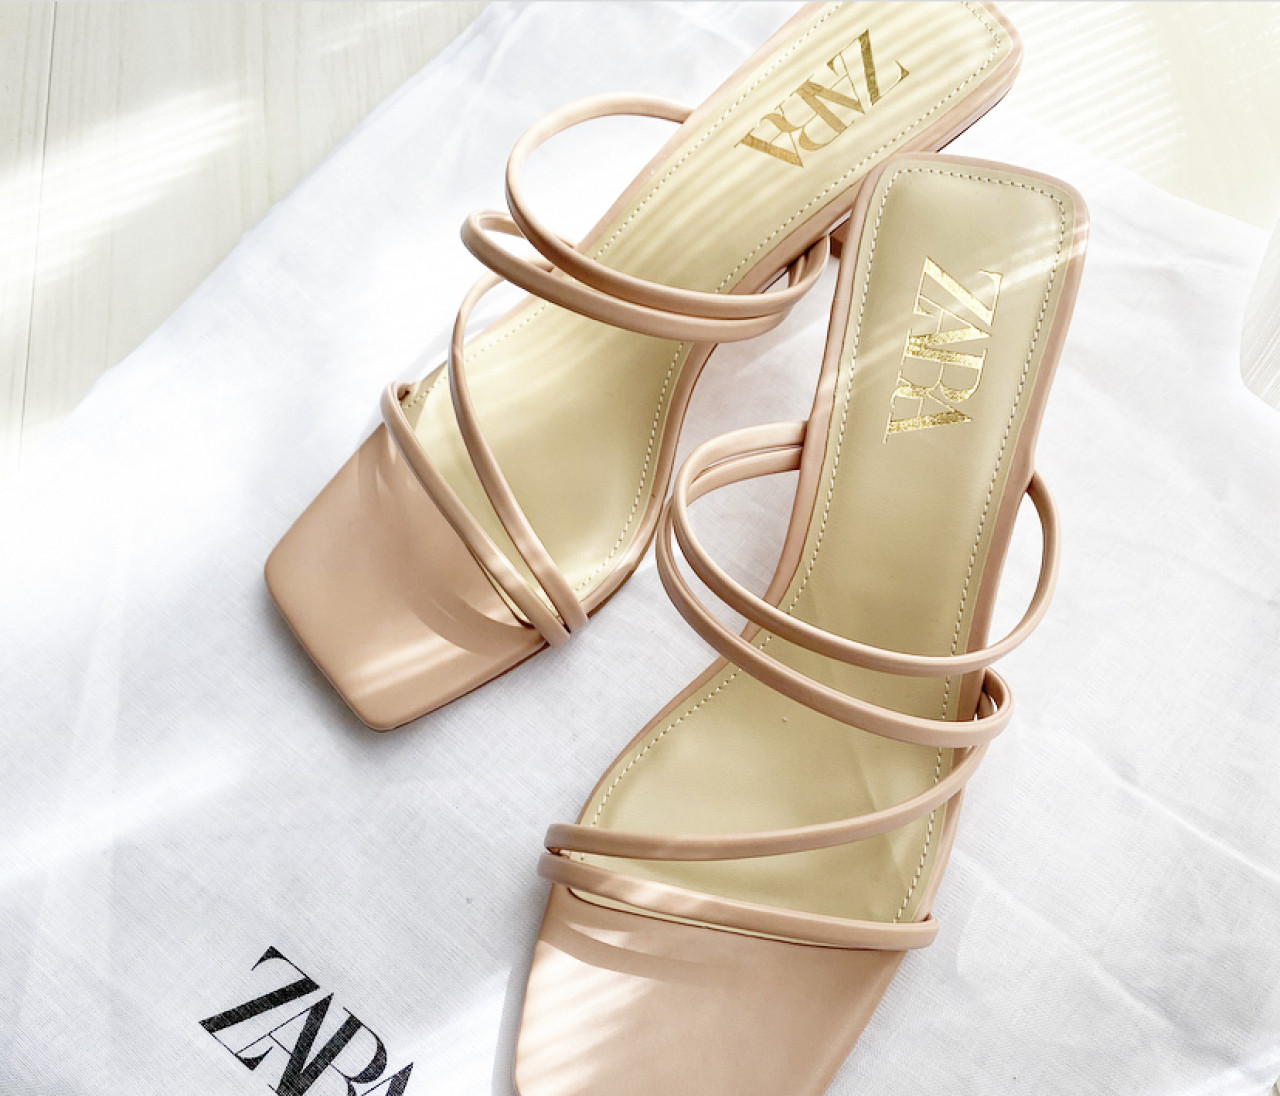 【ZARA購入品】春に向けてピンクサンダルを新調